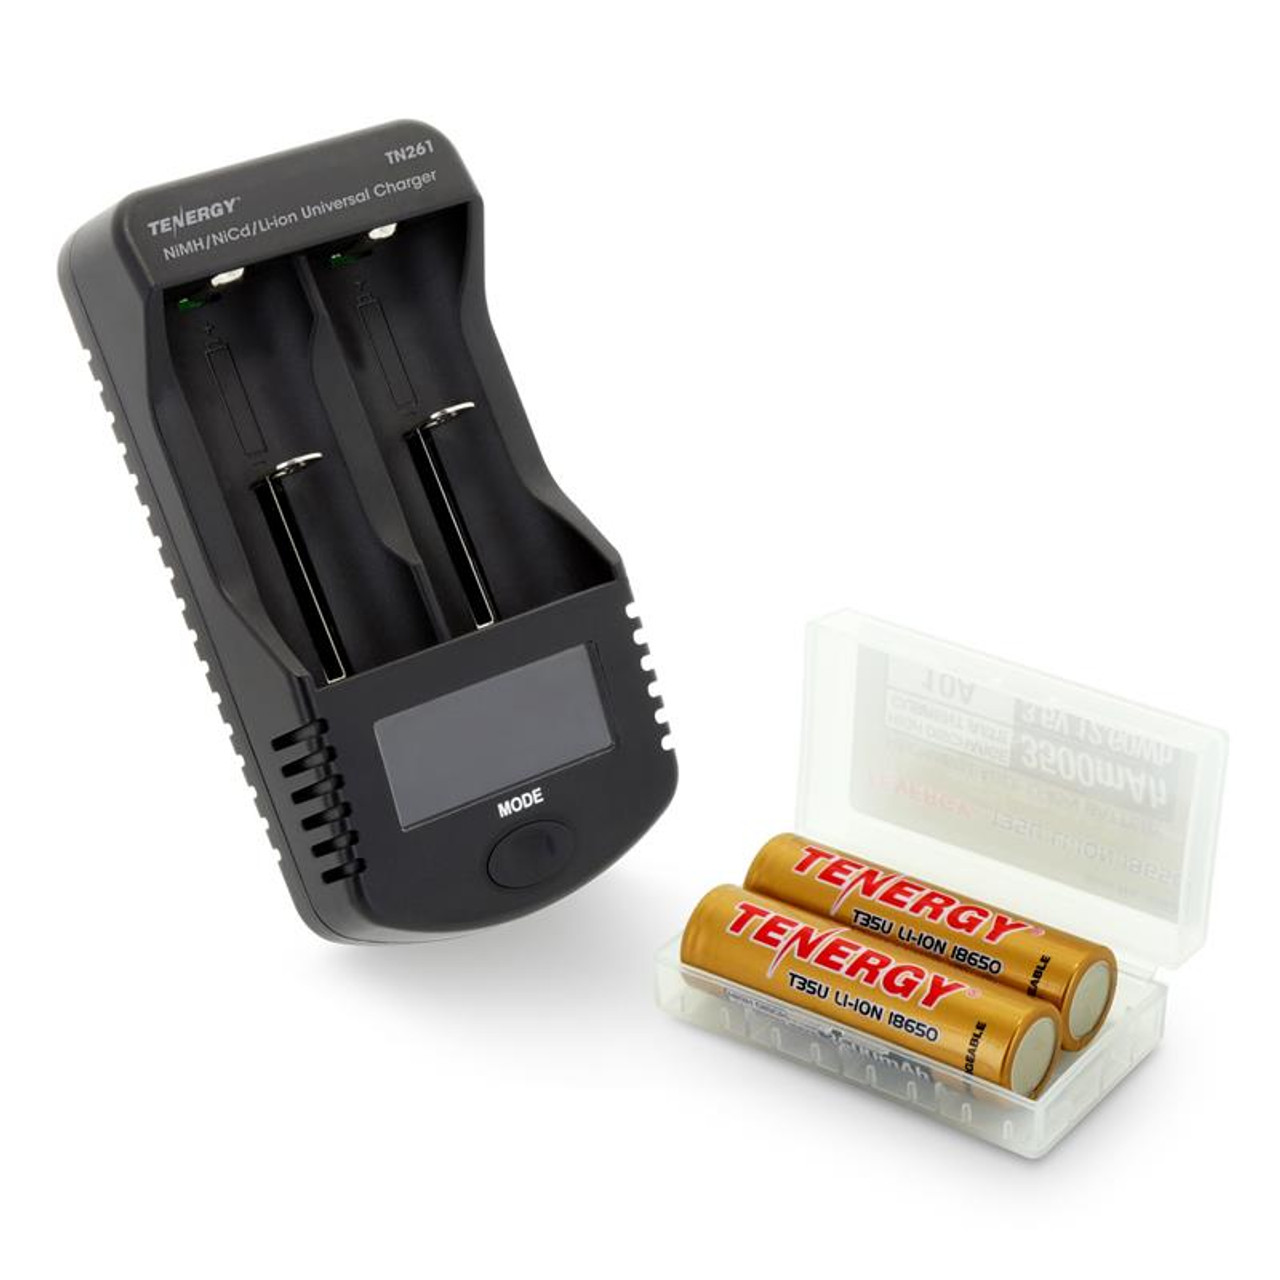 Tenergy TN261 Smart Universal Charger + 2-Pack T35U 3.6V 3500mAh 10A 18650 Li-ion Battery